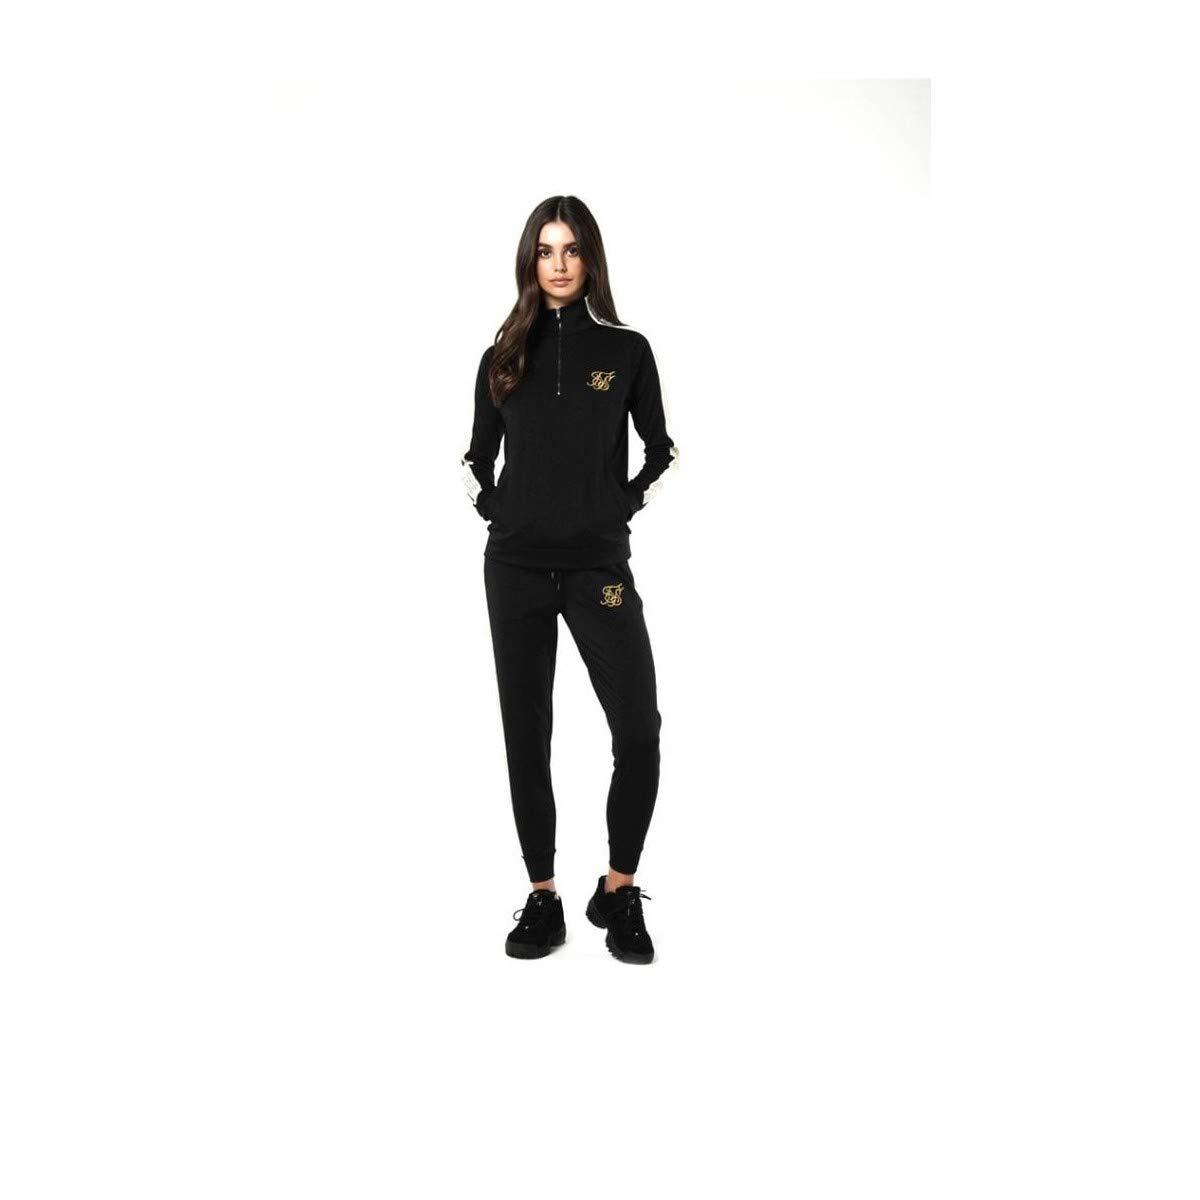 Sik Silk - SSW-1136 - Sudadera Mujer Logo Lateral (XS): Amazon.es ...